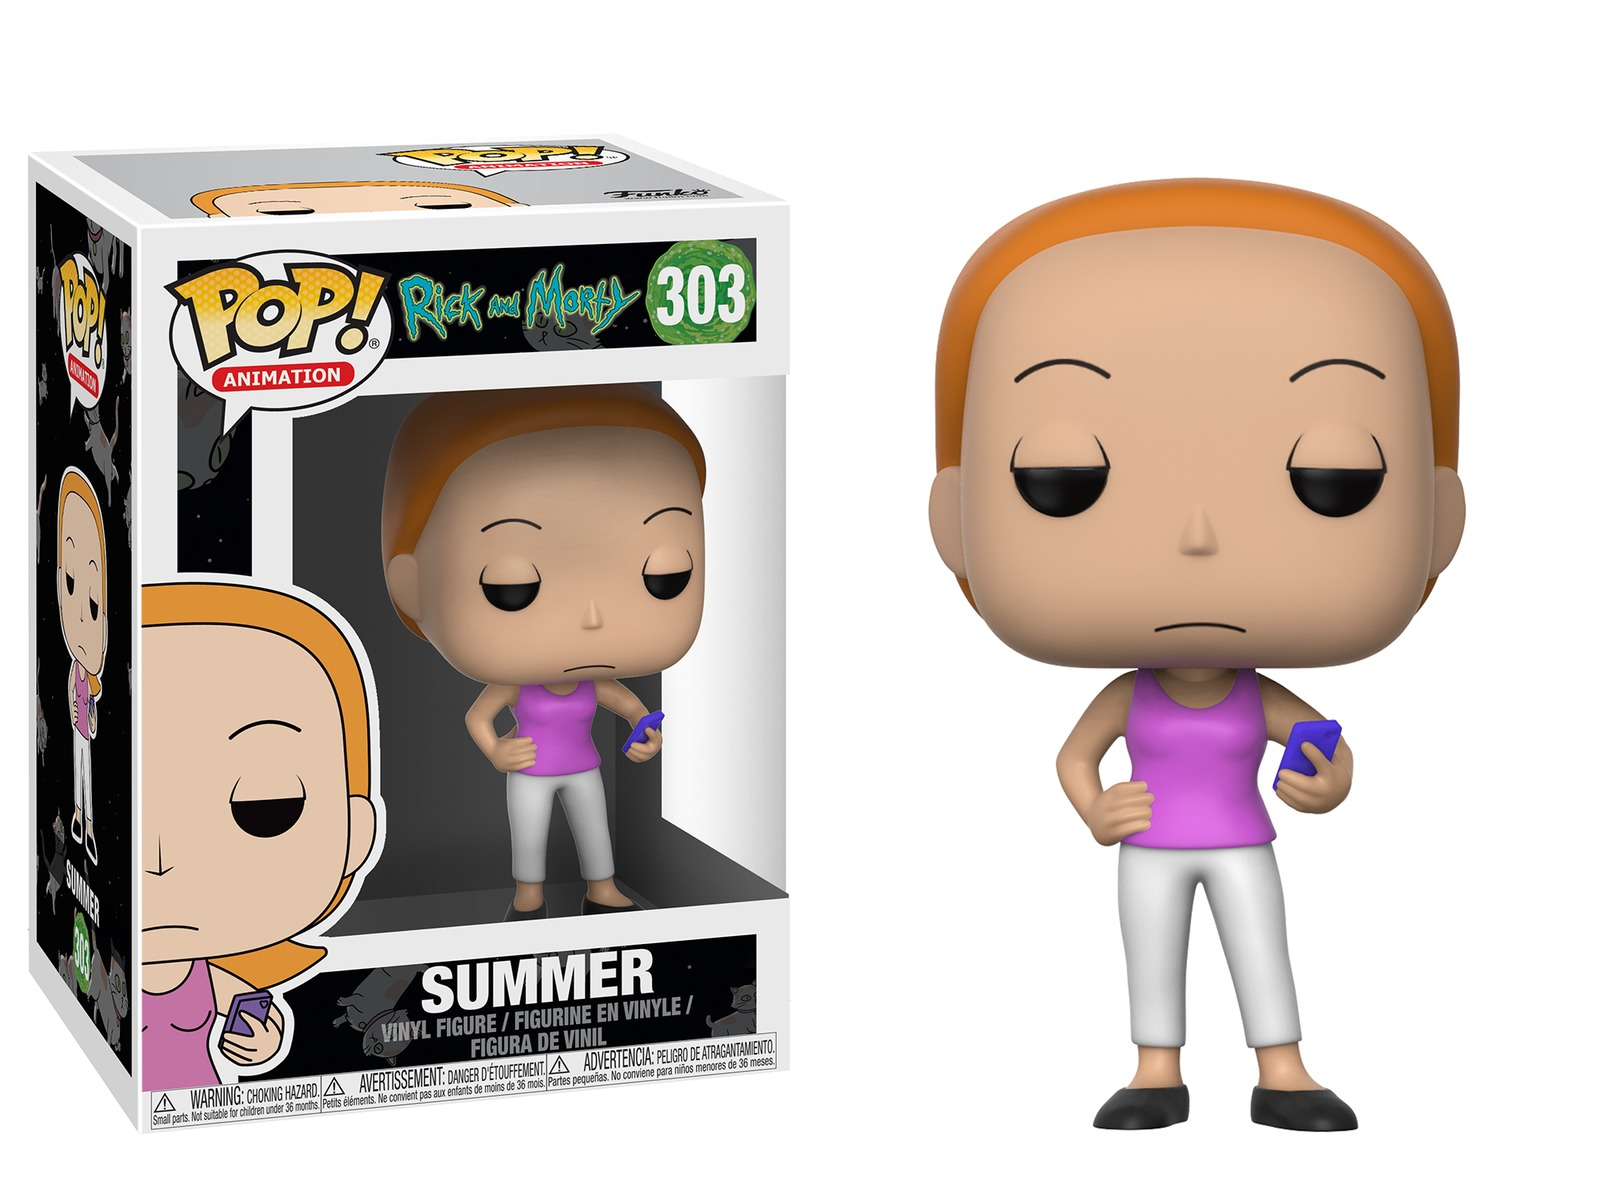 Rick & Morty – Summer Pop! Vinyl Figure image